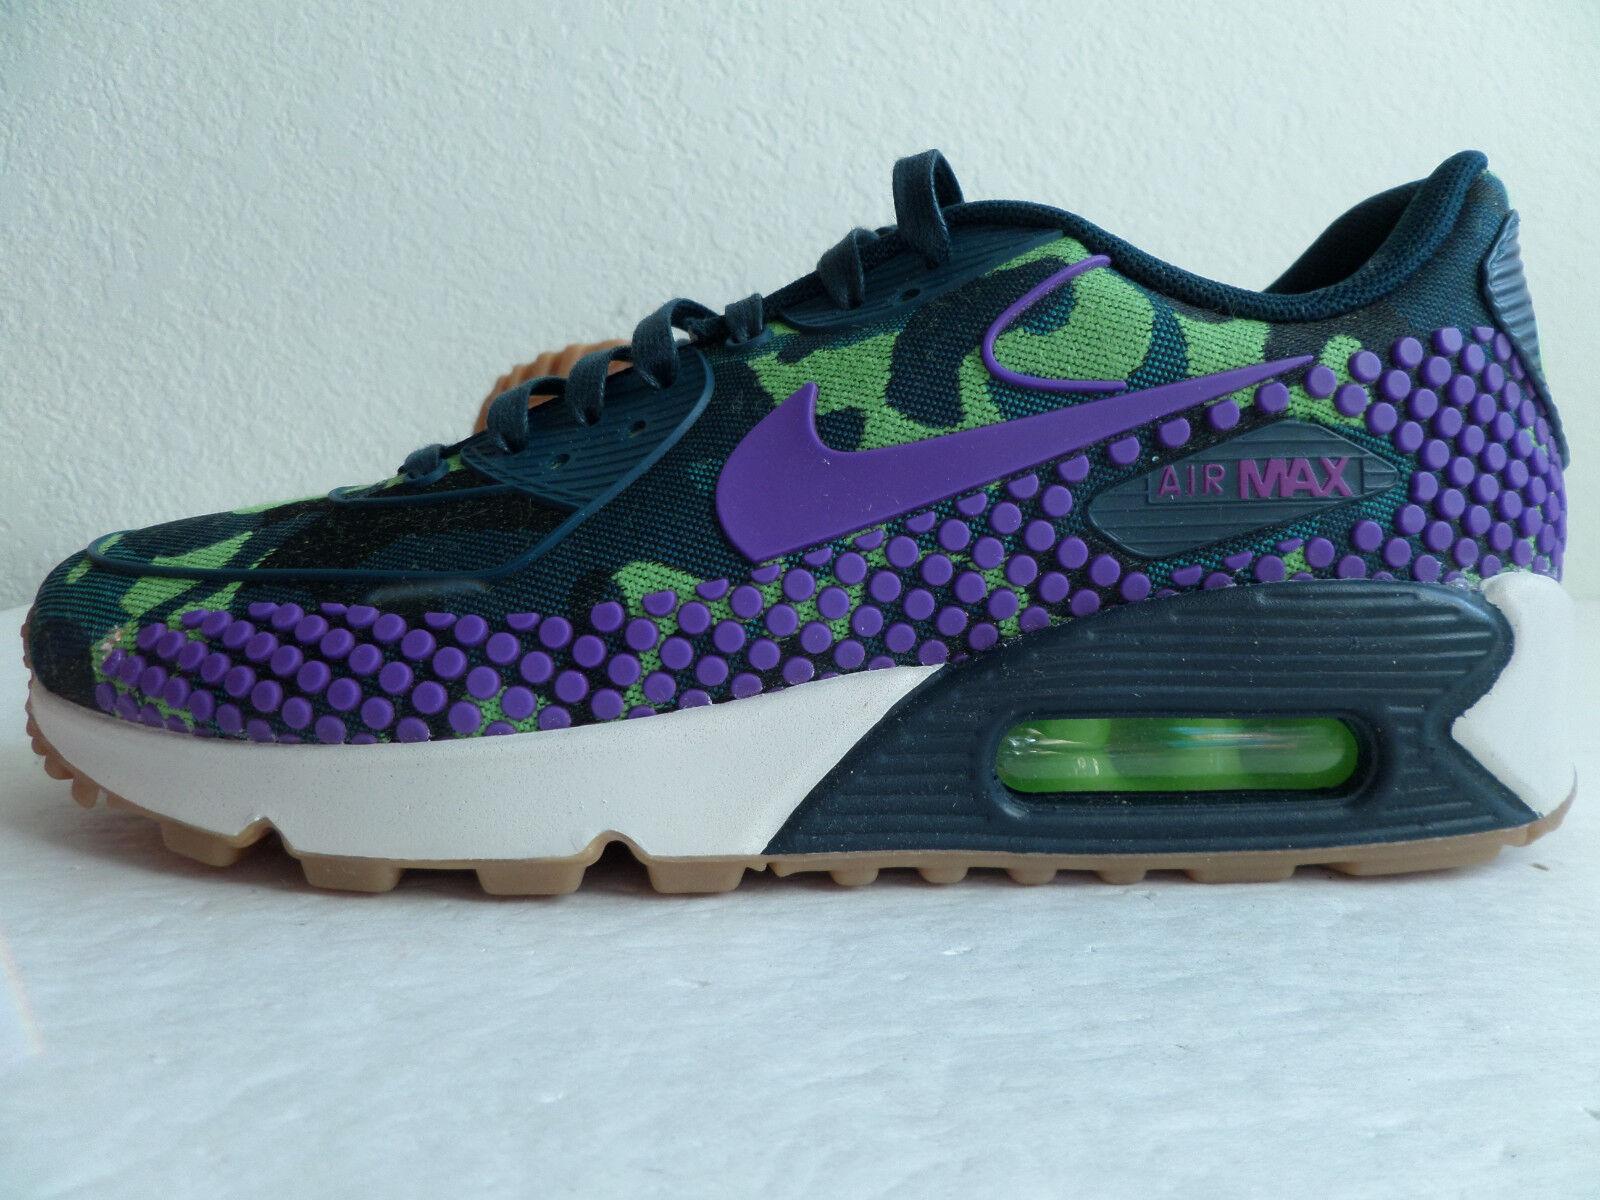 Nike Air Max 90 Jacquard Premium Women Running Shoes Green Camouflage 807298 300